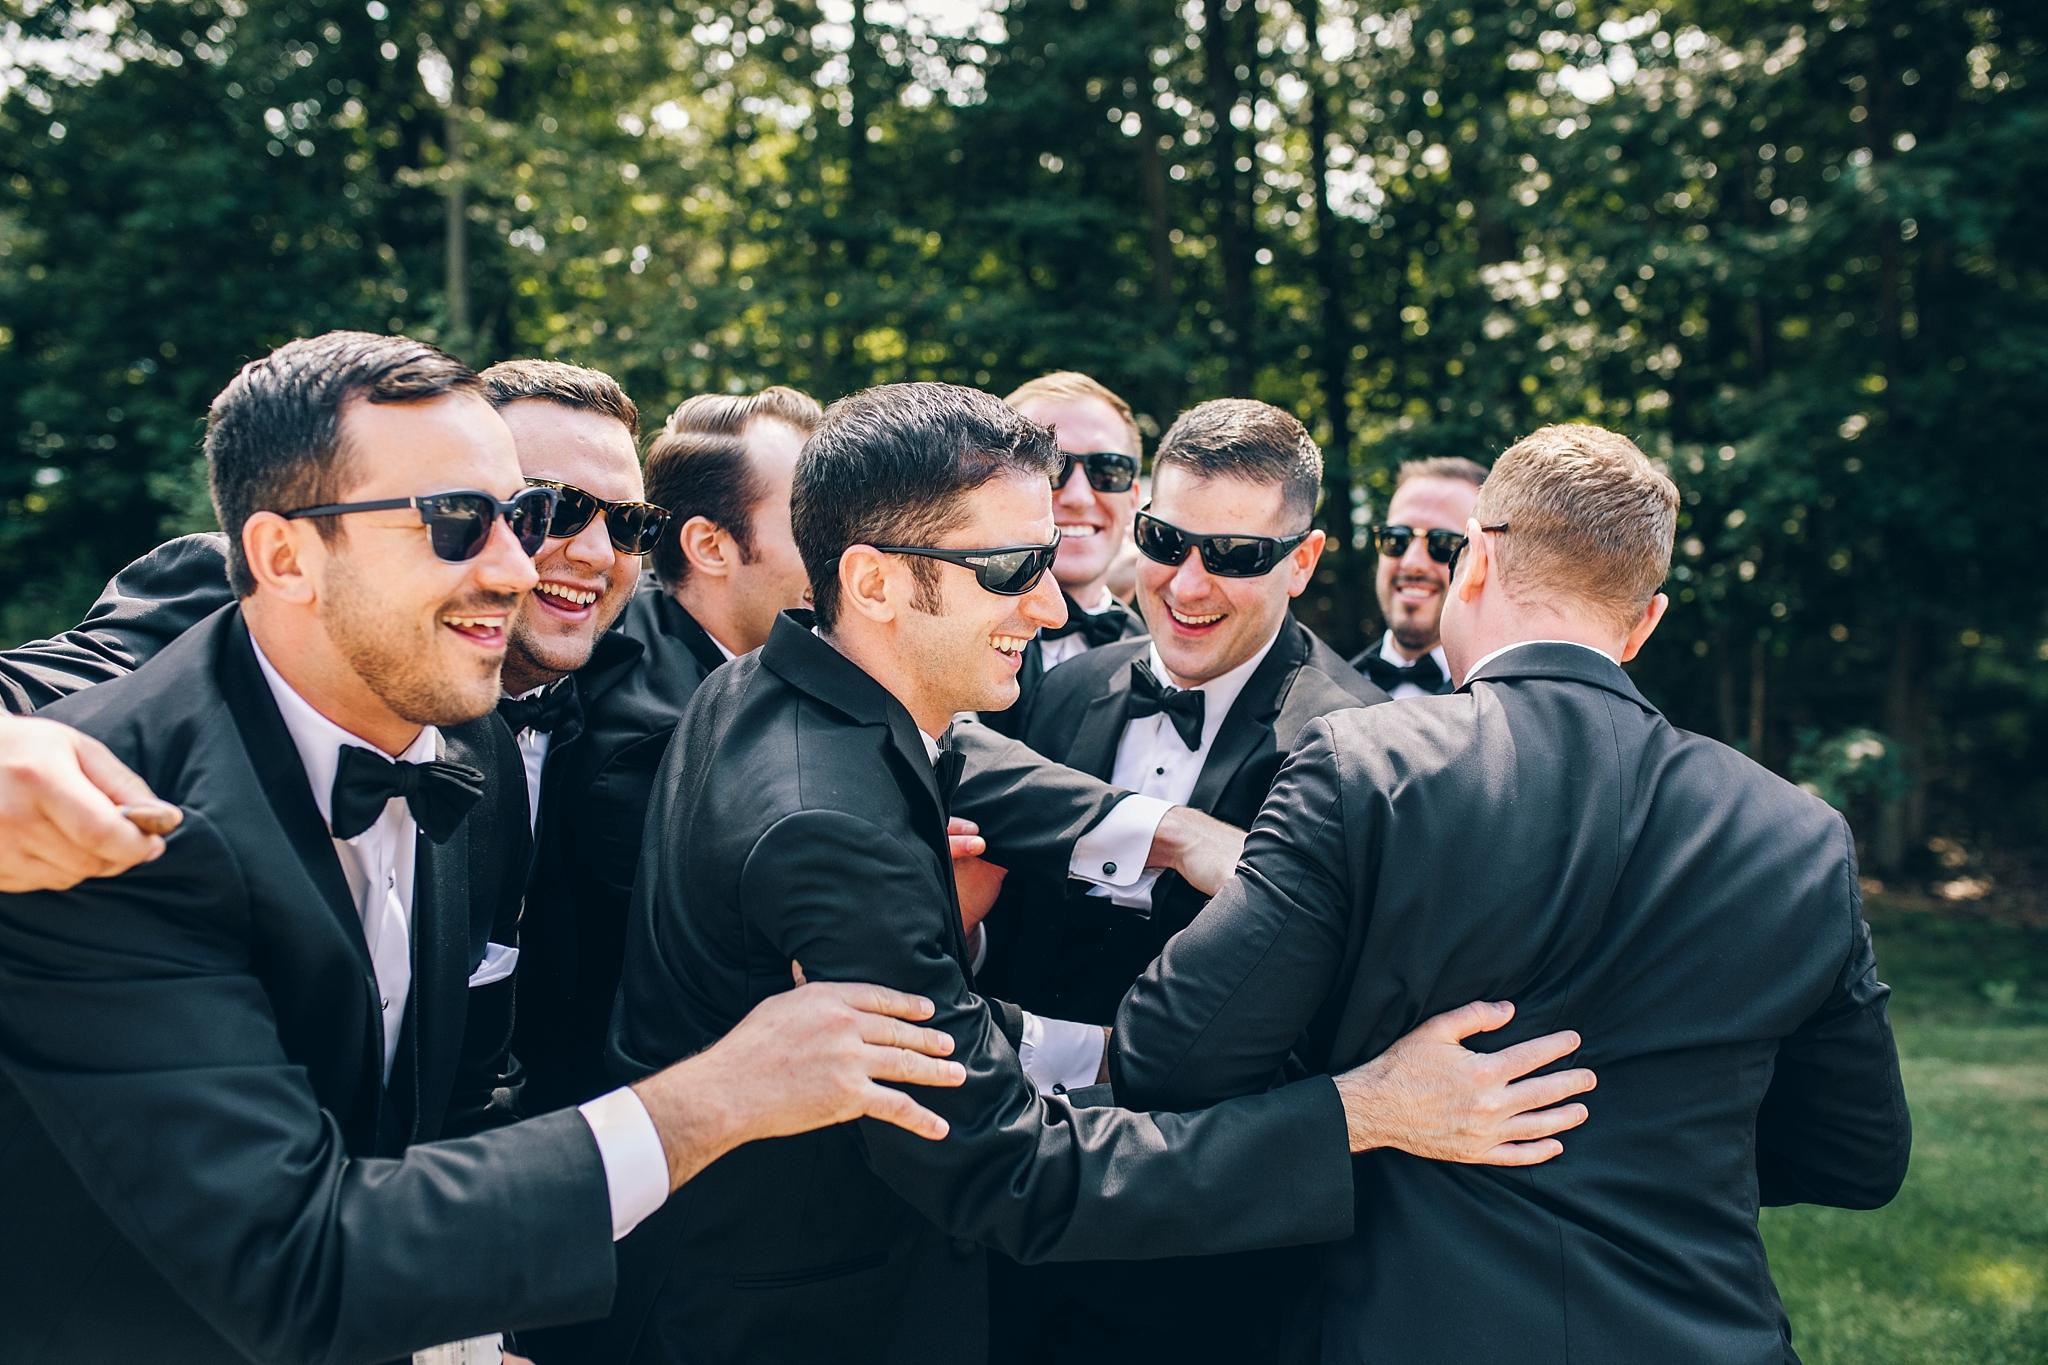 baker-lofts-holland-michigan-wedding-photographer_0329.jpg